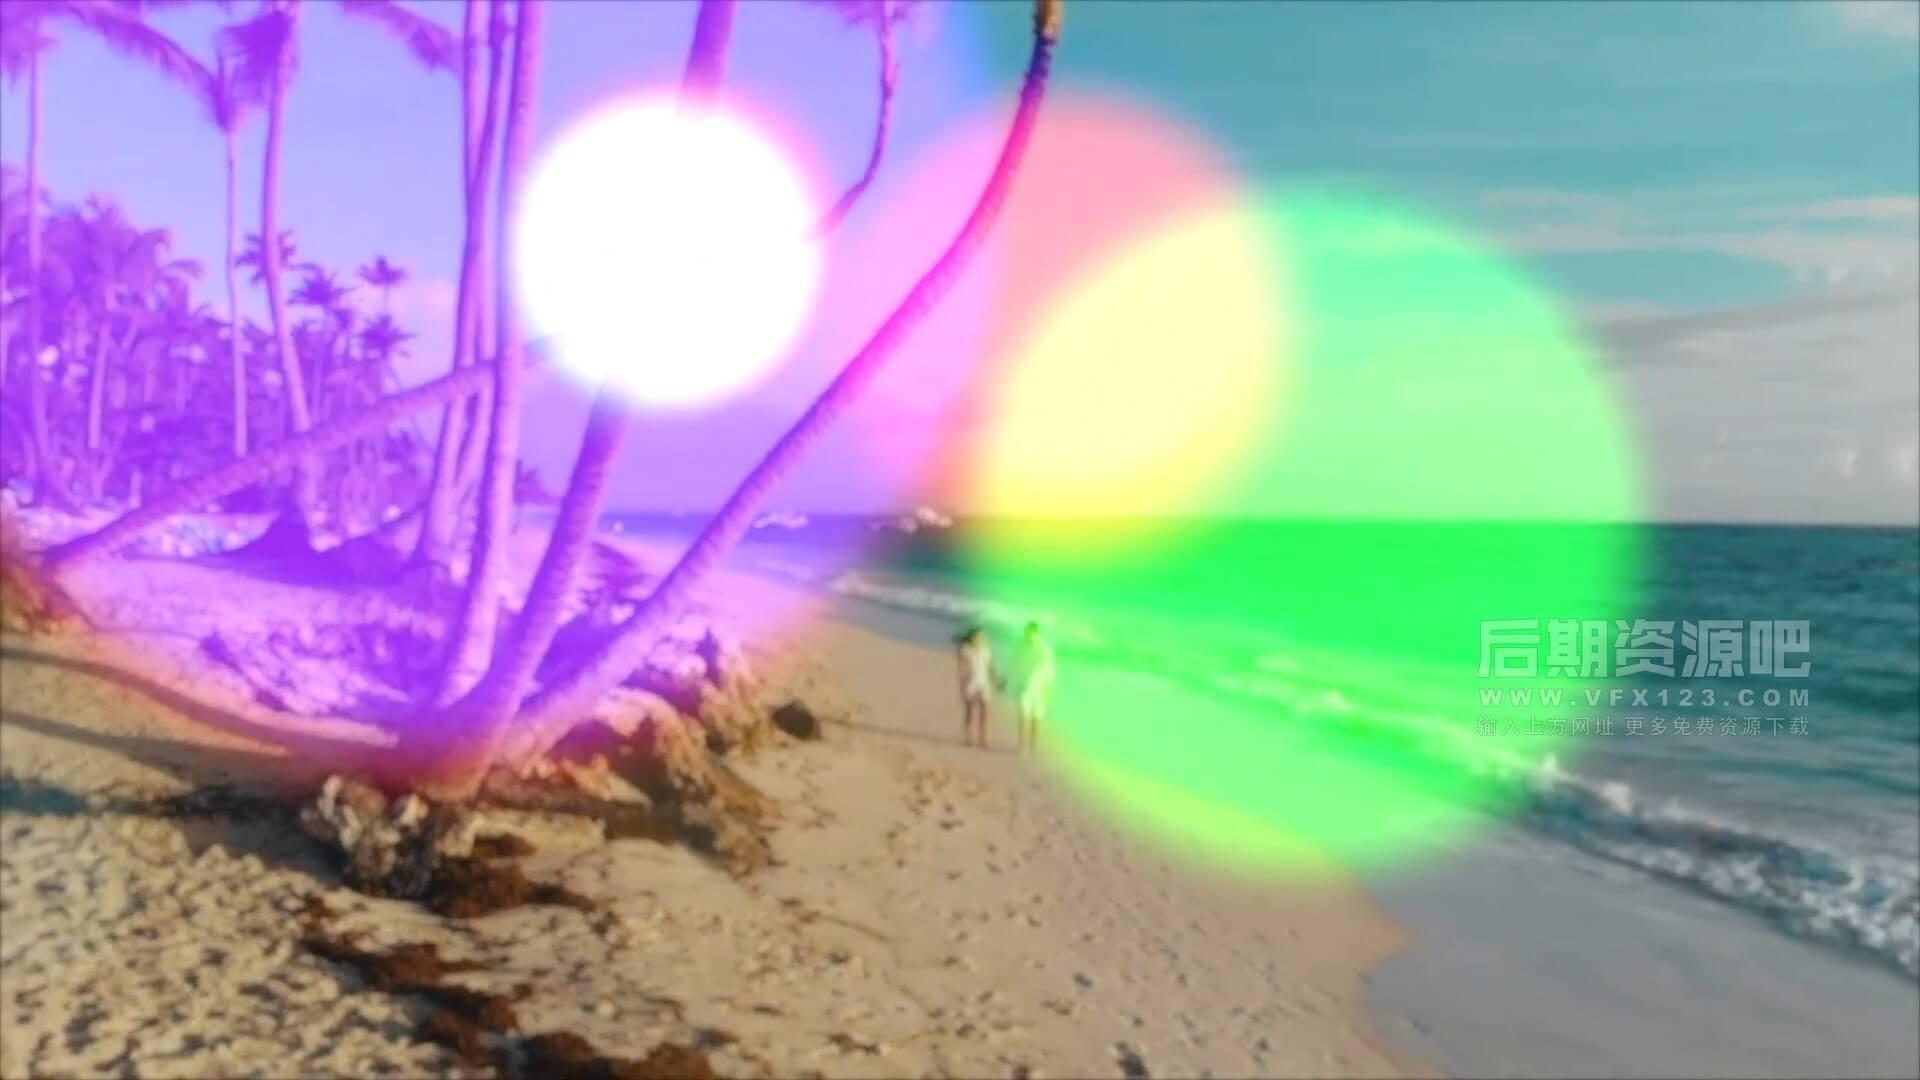 fcpx插件 为影片添加镜头光斑炫光光晕效果预设 Bokeh Effect